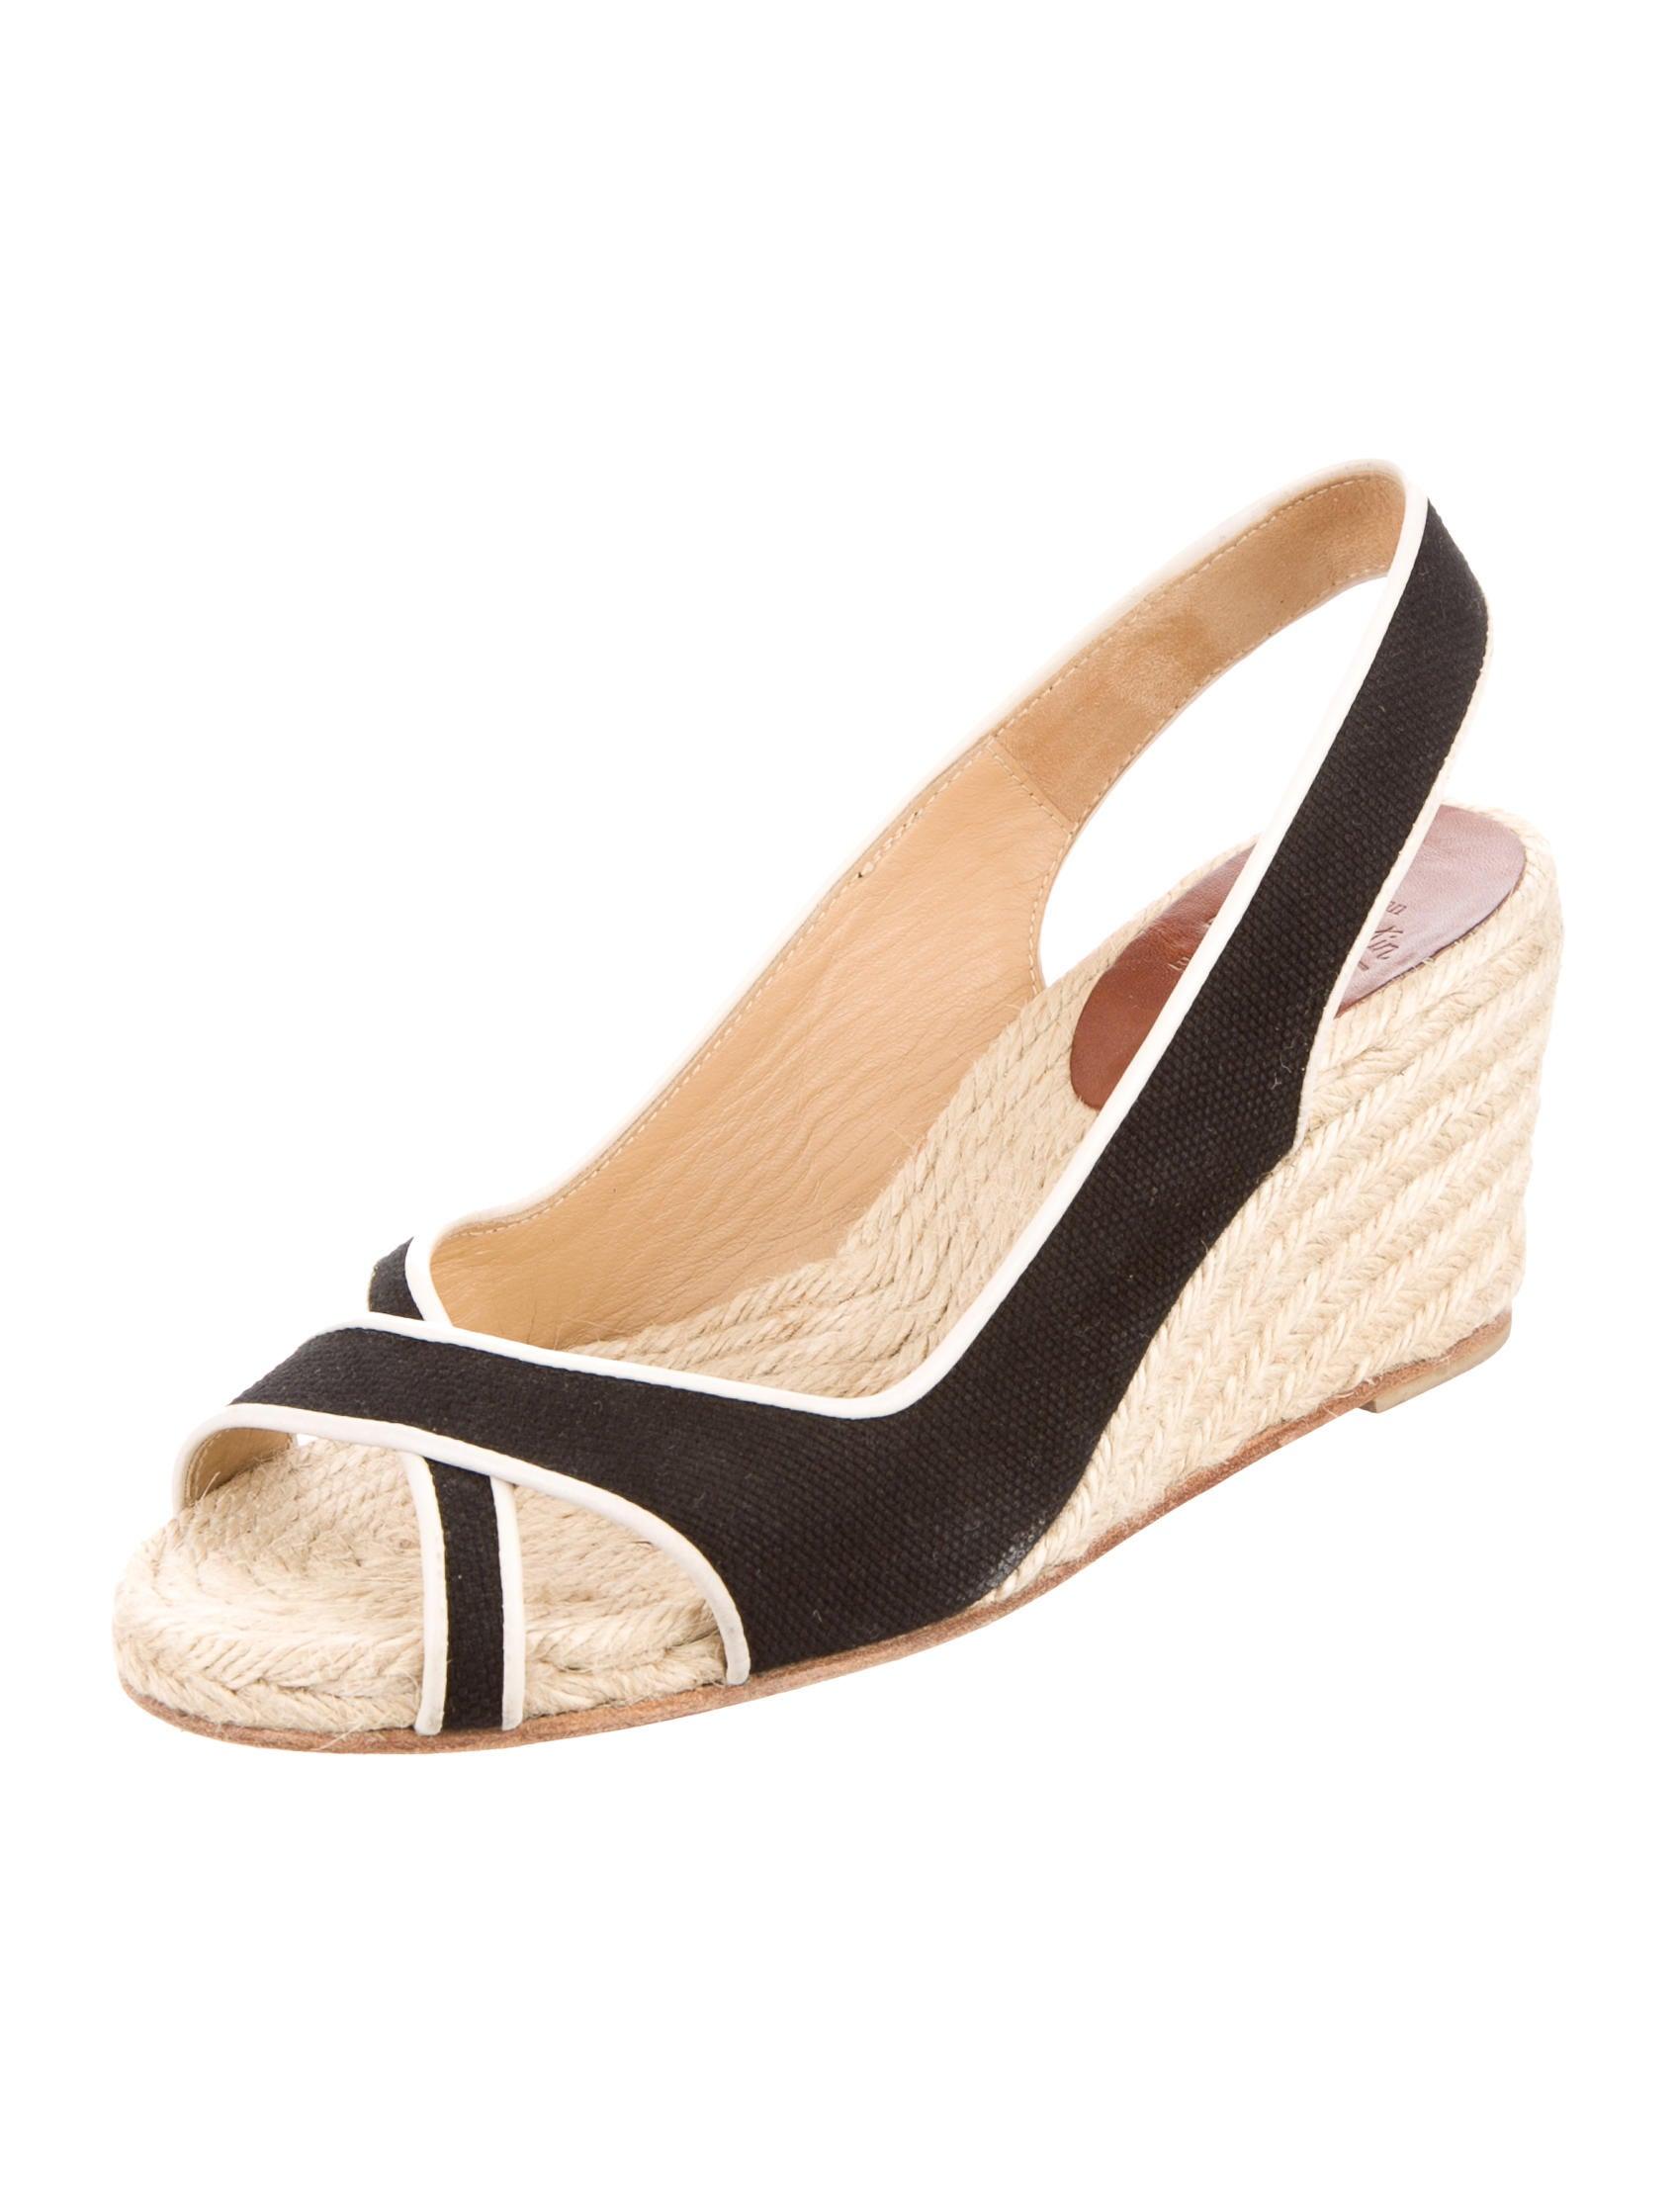 christian louboutin espadrille slingback wedges shoes